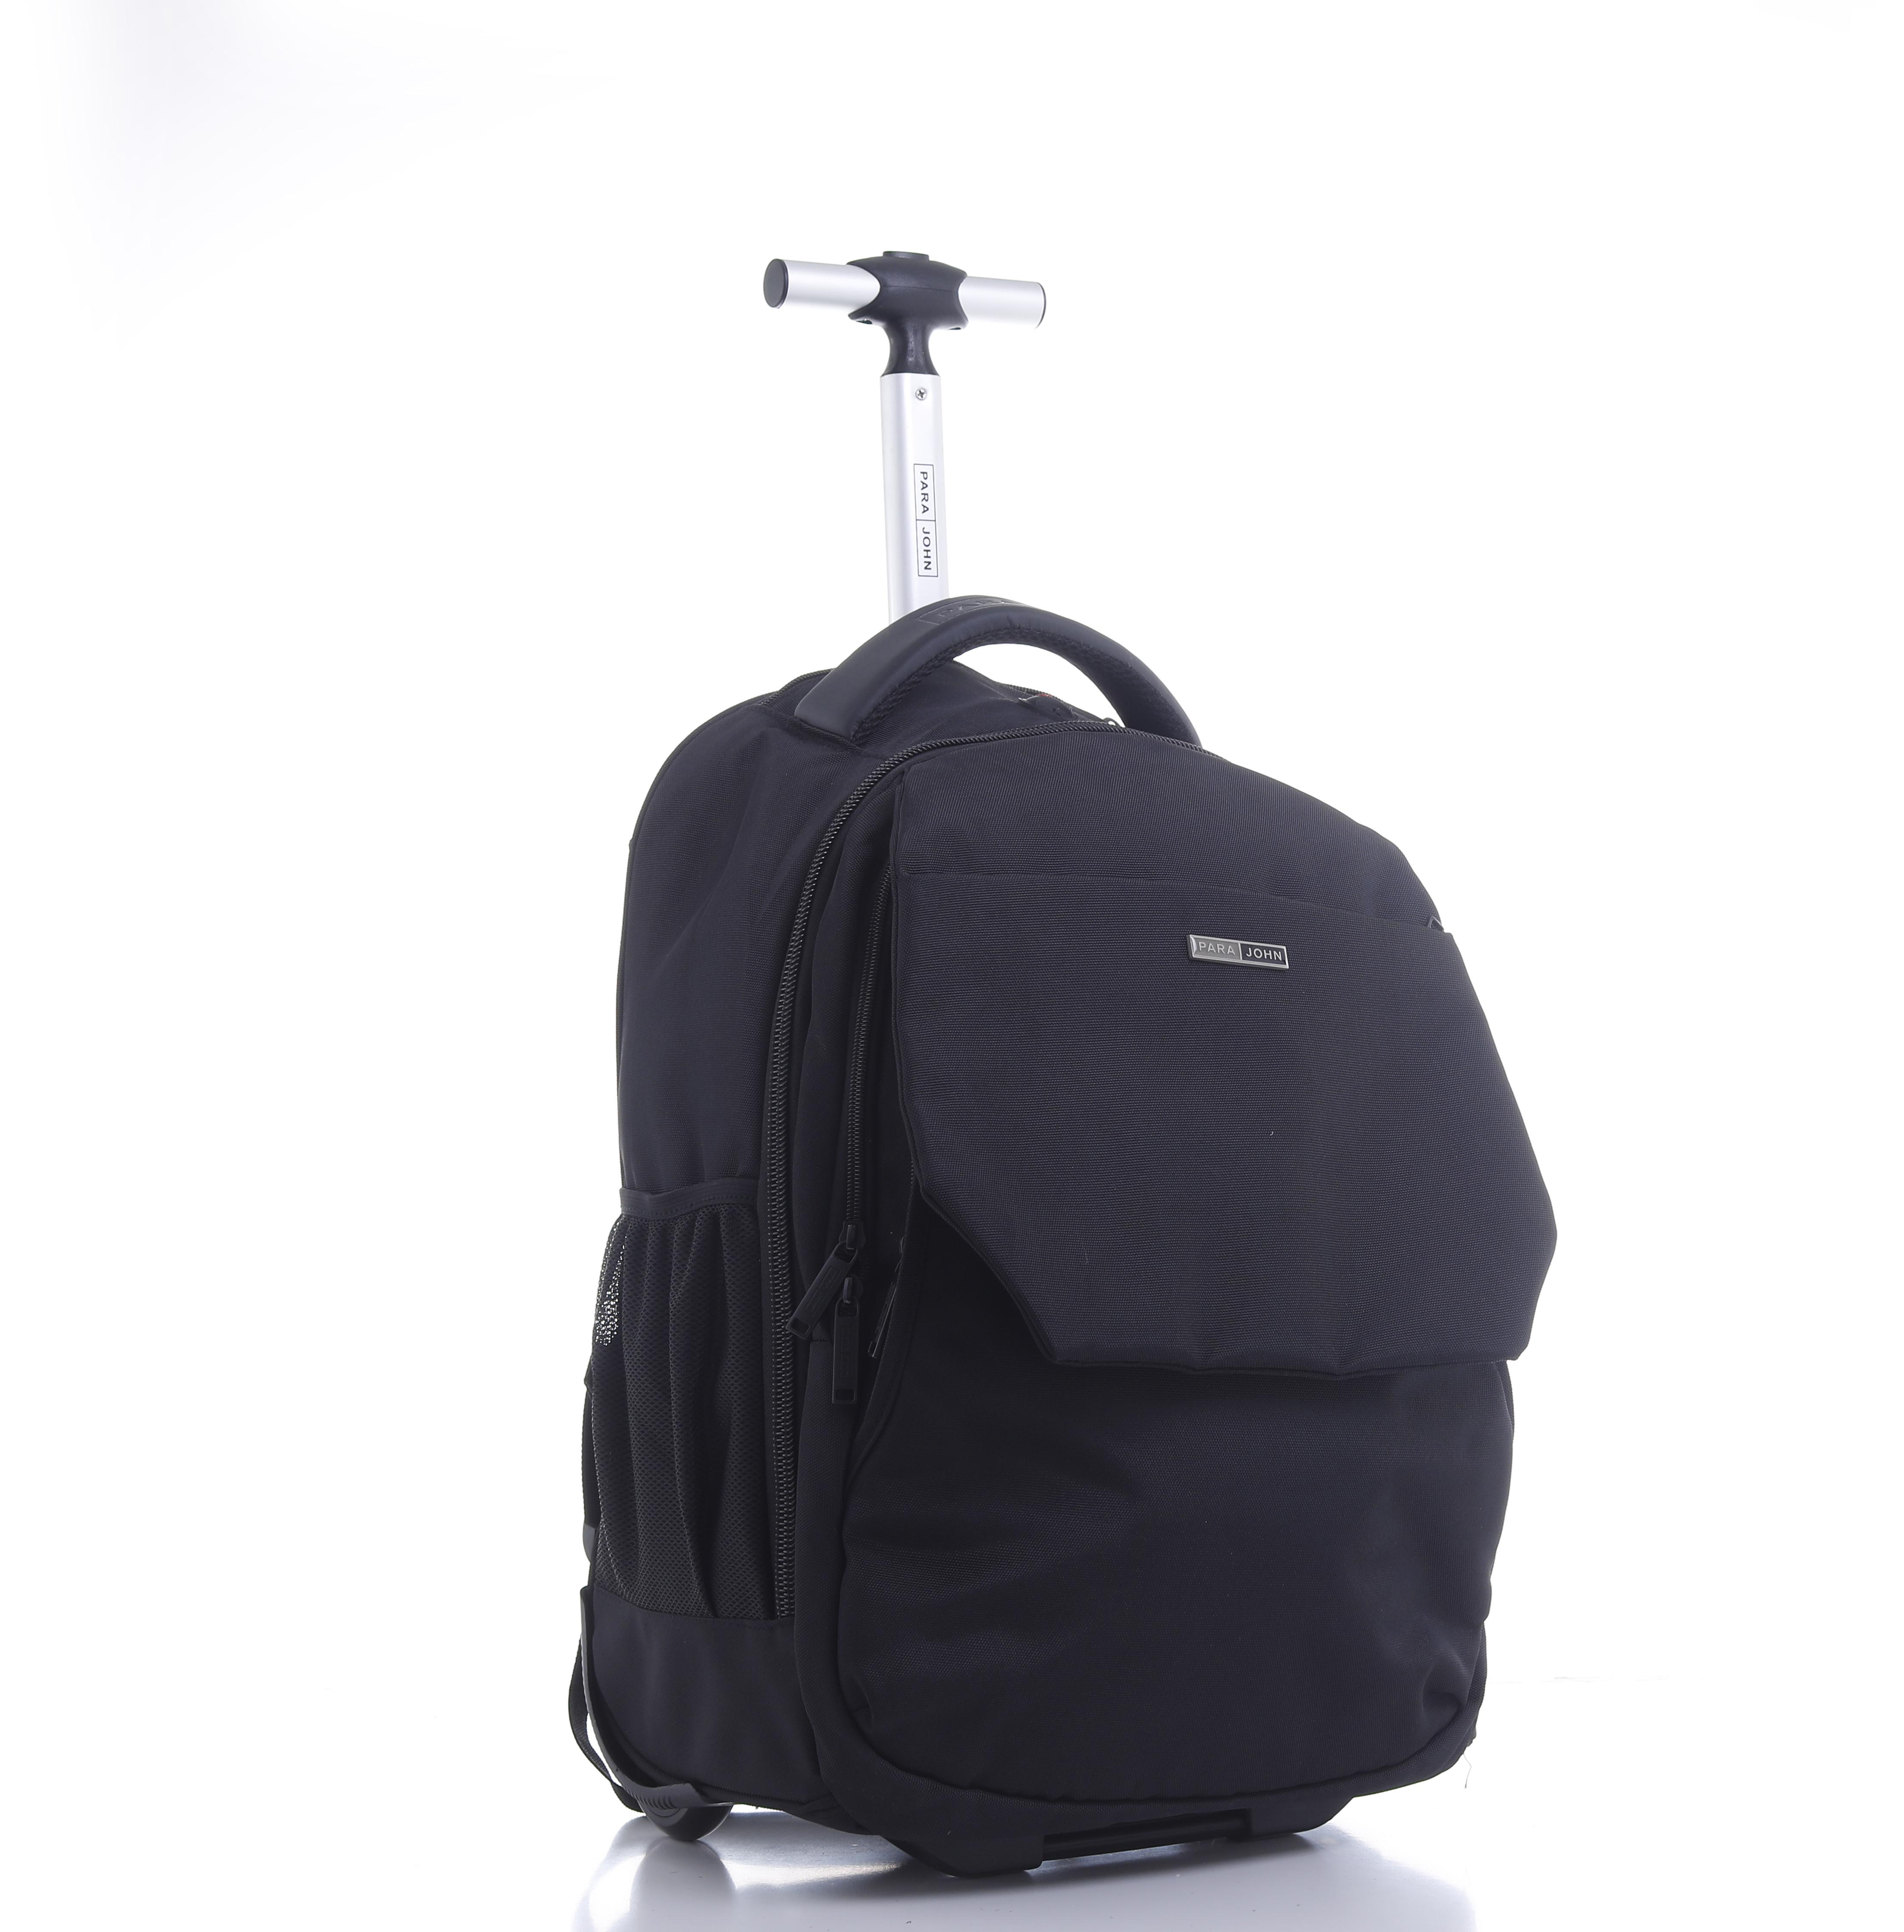 Para john rolling wheeled backpack, 20'' rucksack – business travel laptop backpack/rucksack - wheeled cabin hand luggage laptop backpack college school computer rucksack bag for men/women